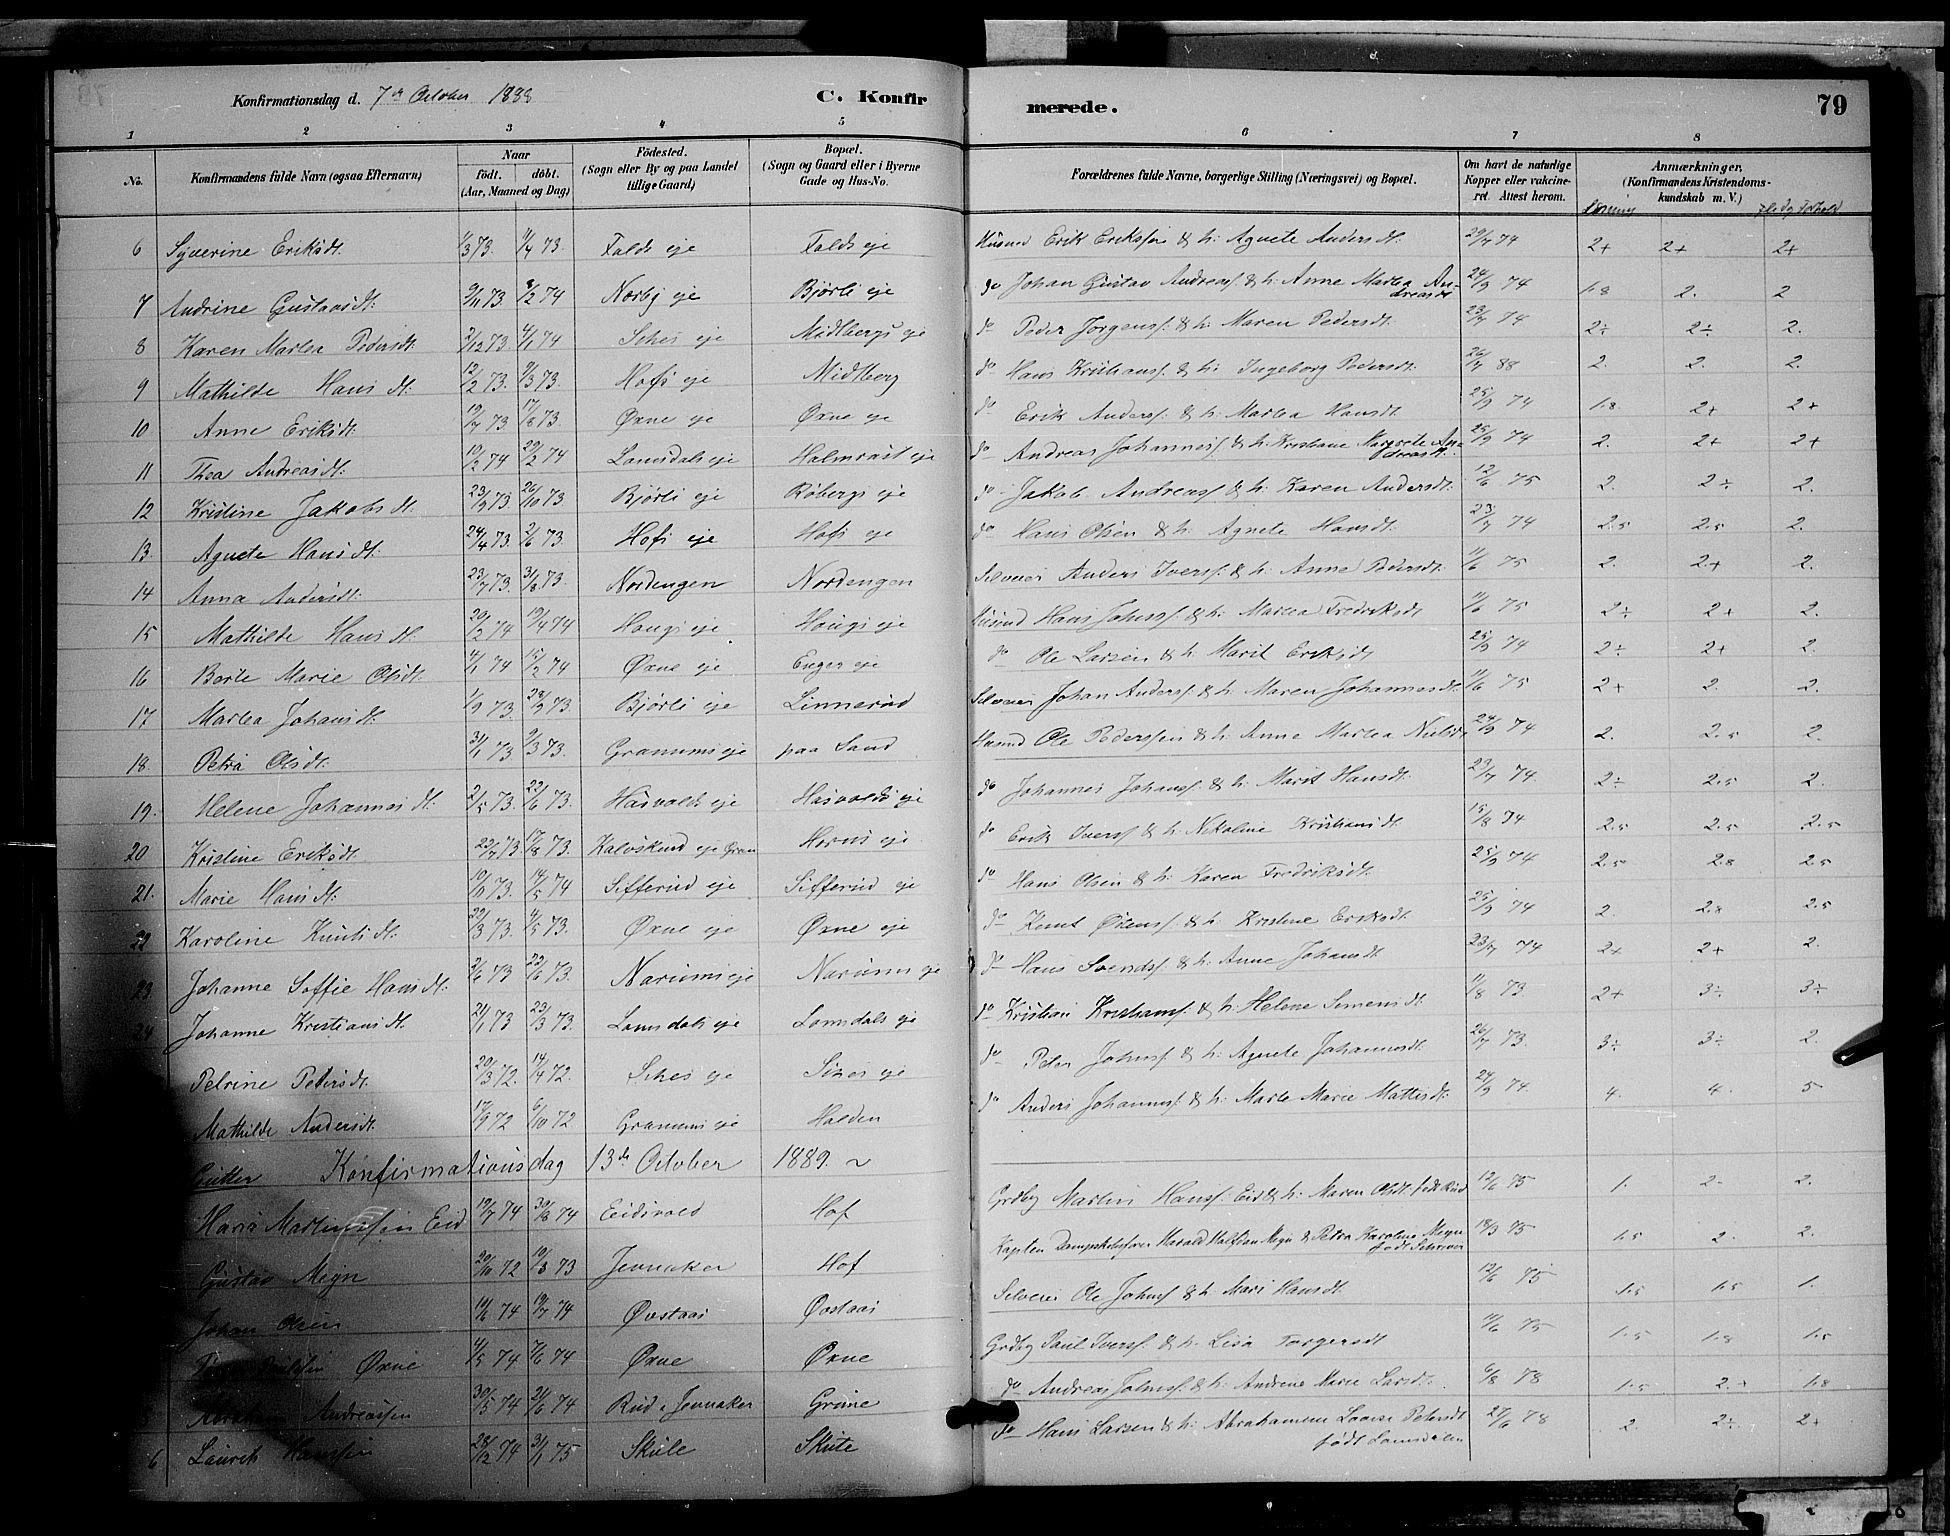 SAH, Søndre Land prestekontor, L/L0002: Klokkerbok nr. 2, 1884-1900, s. 79